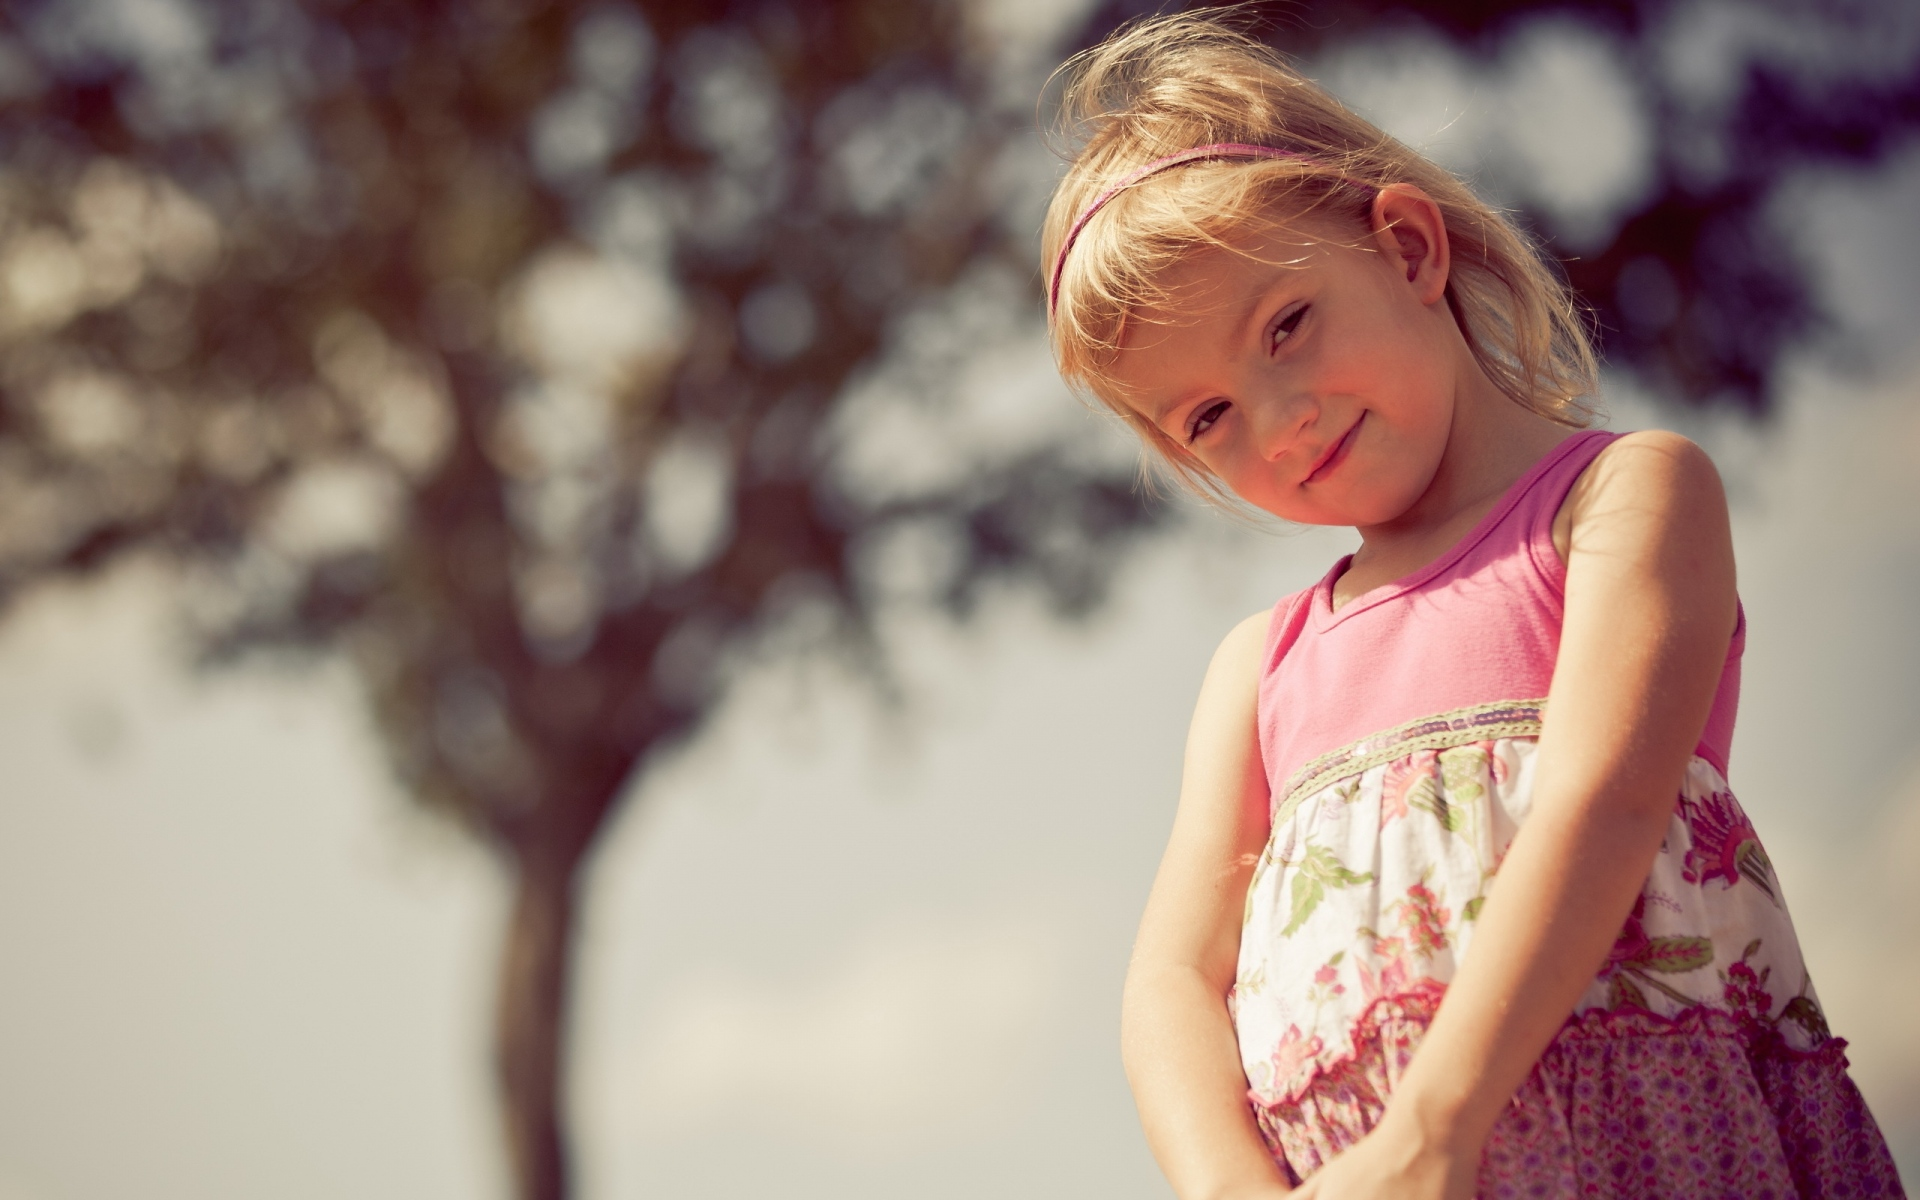 Картинки ребенка, девушка, платье, улыбка фото и обои на рабочий стол